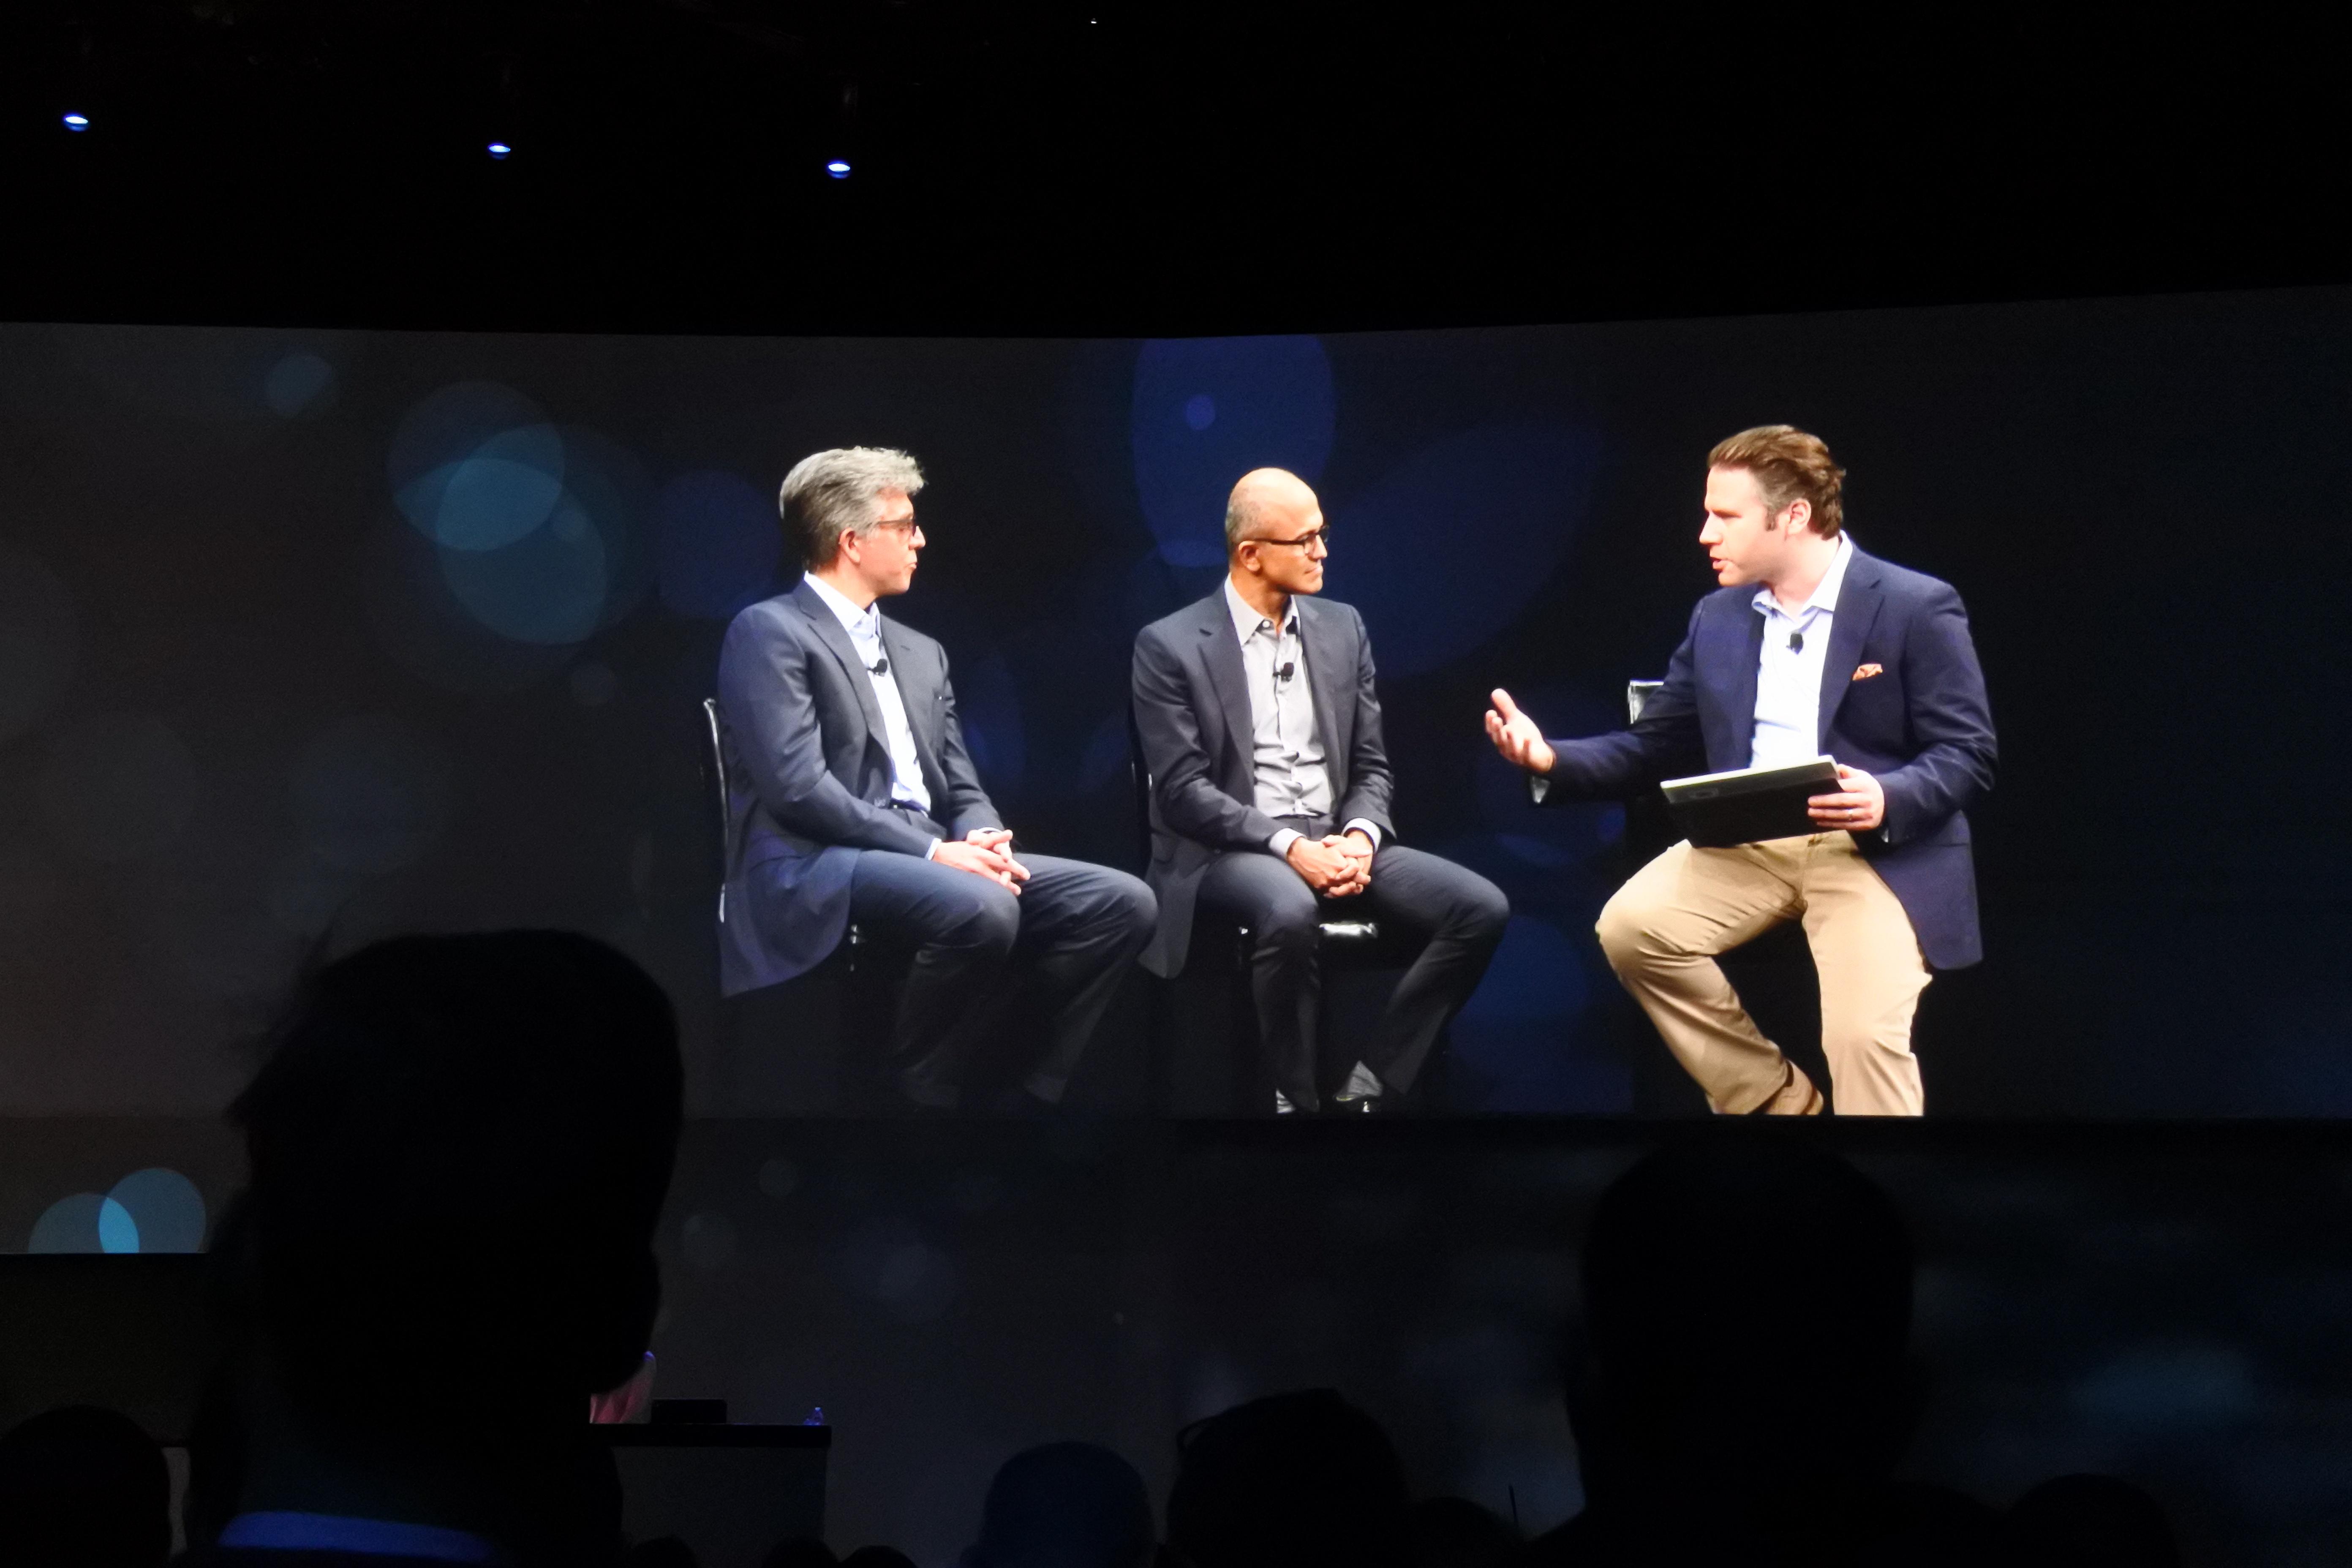 SAP CEO Bill McDermott & Microsoft CEO Satya Nadella at the 28th SapphireNow event in Orlando